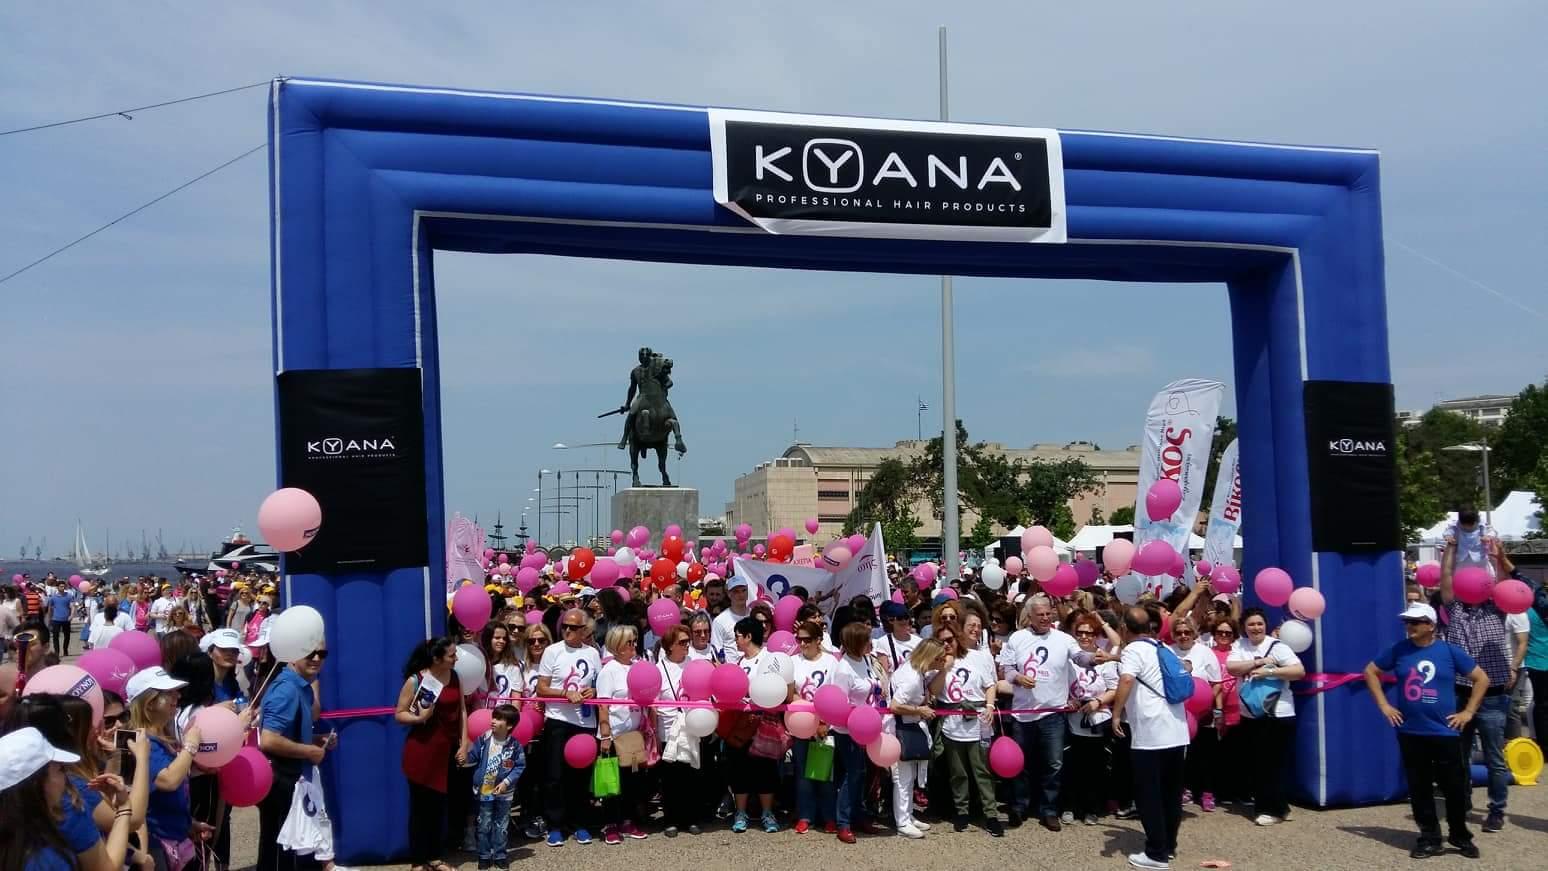 kyana-xorigos-sail-for-pink-5